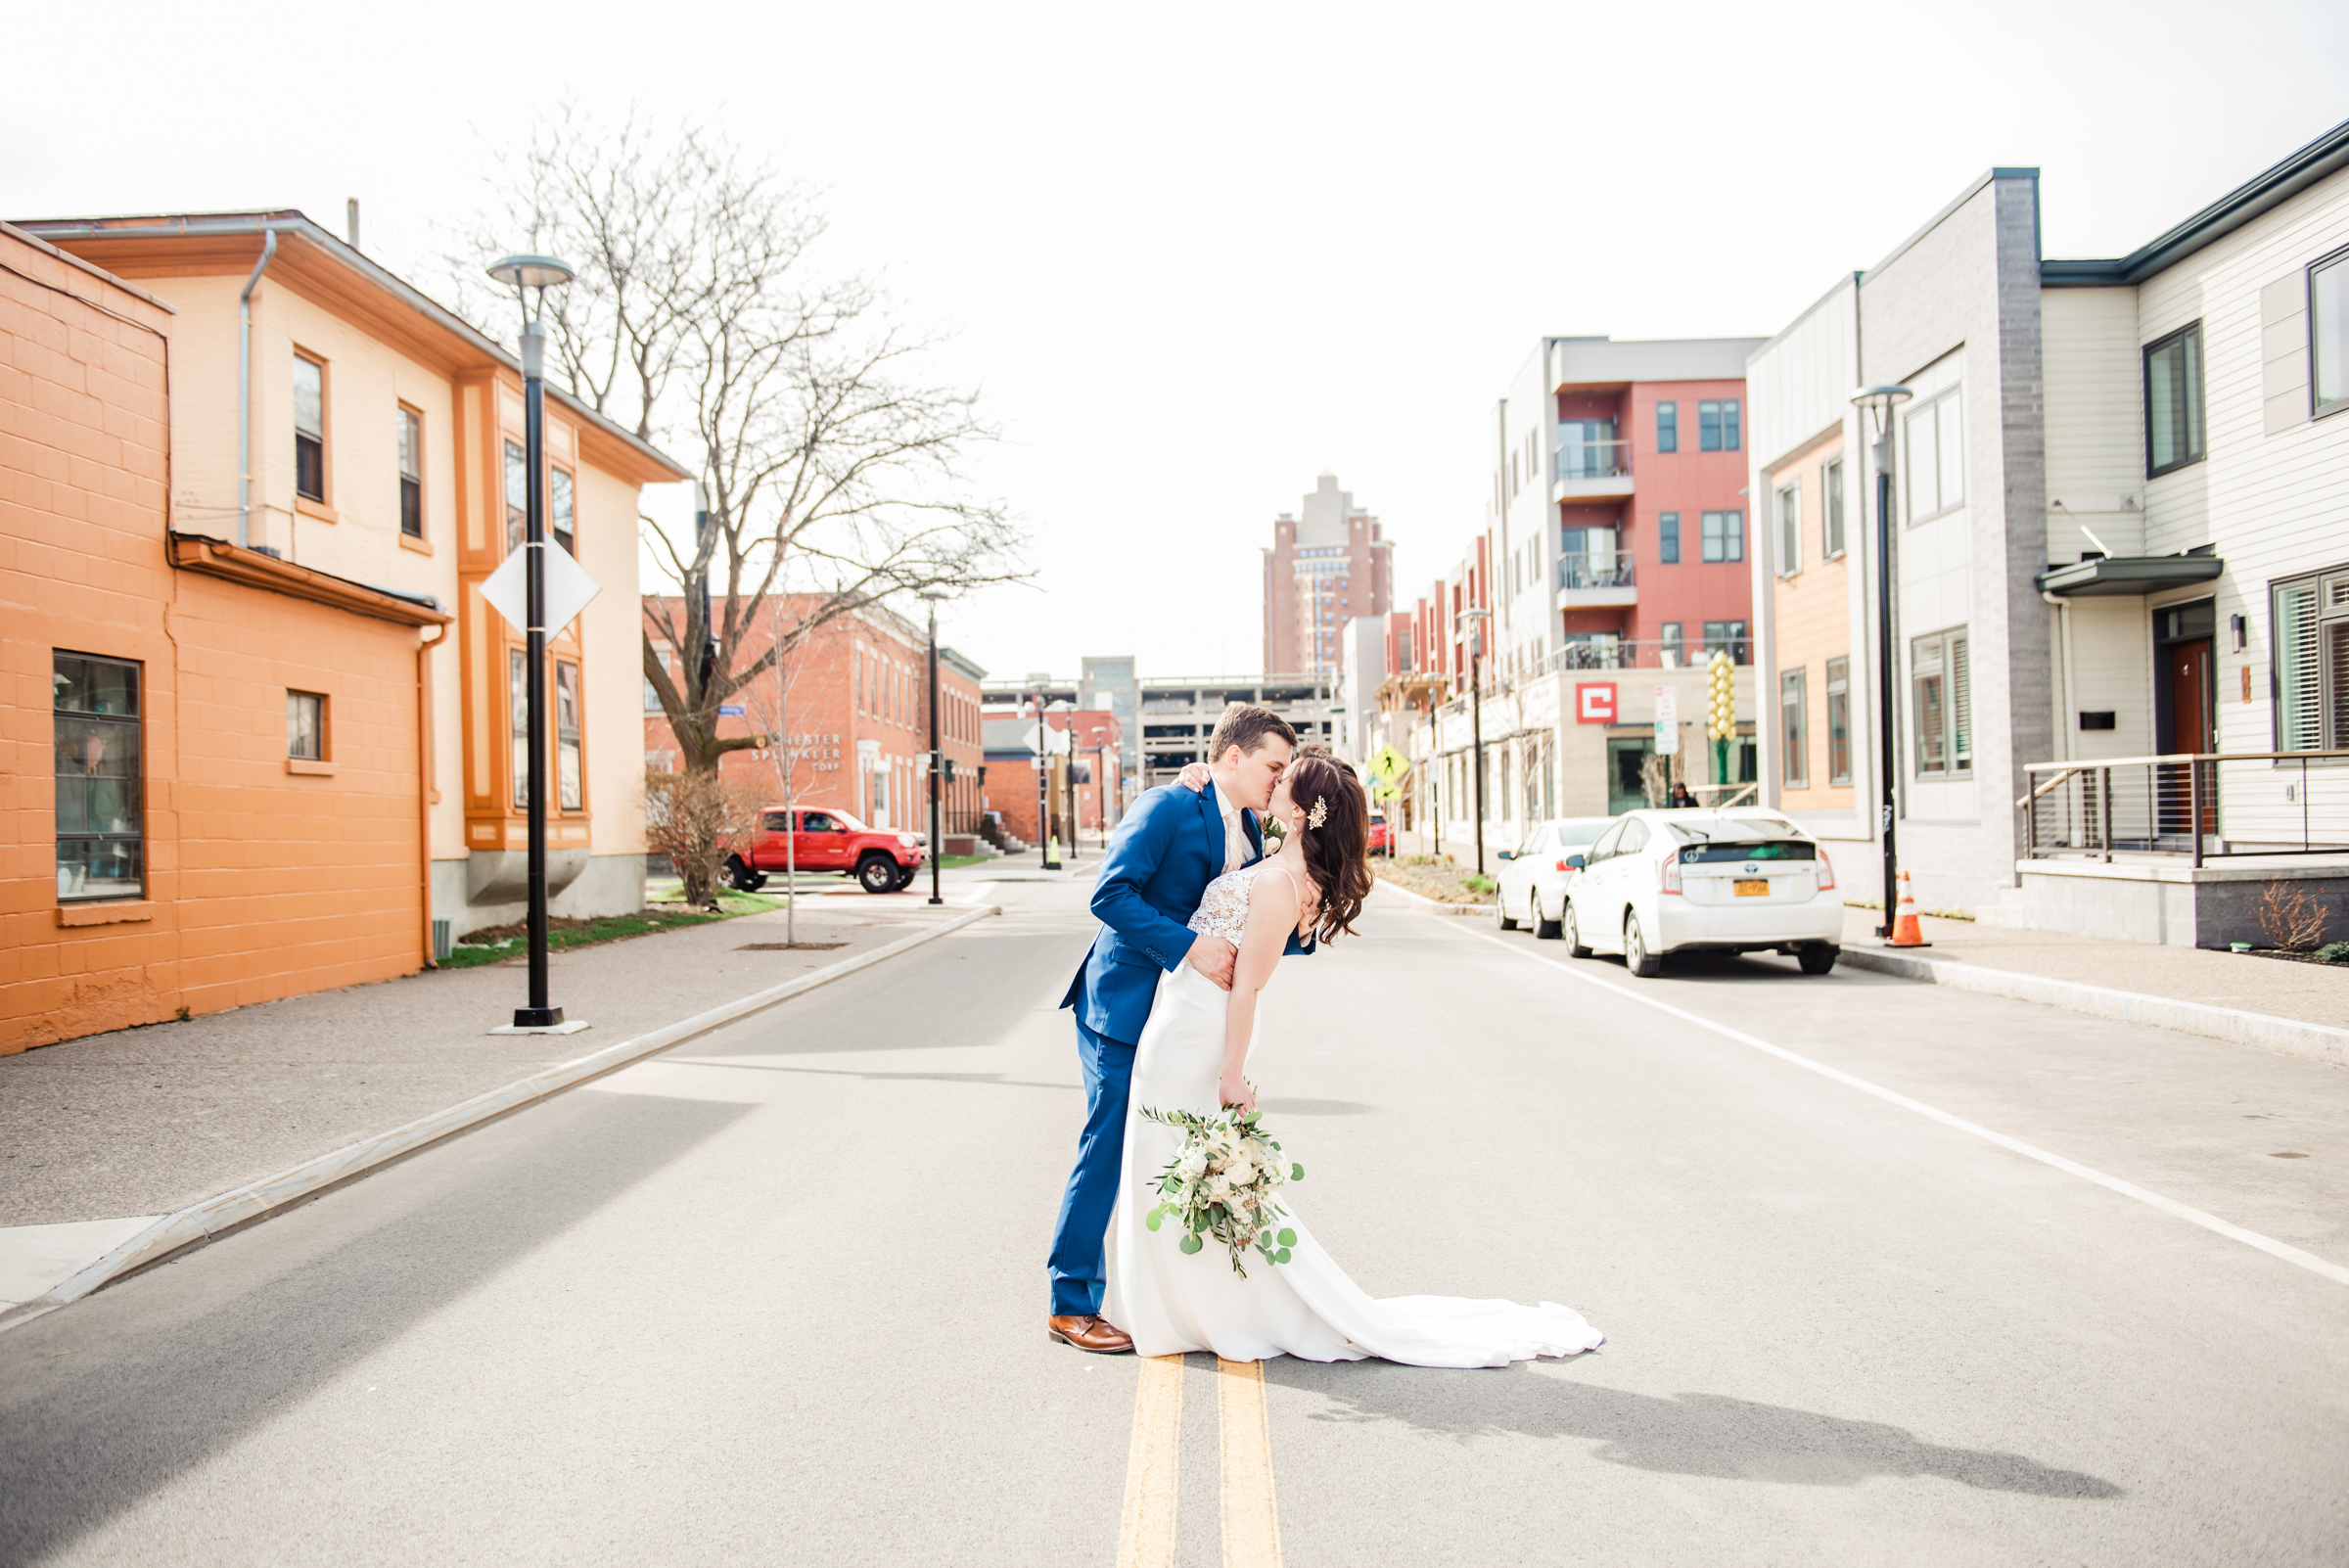 The_Arbor_LoftRochester_Wedding_JILL_STUDIO_Rochester_NY_Photographer_160101.jpg